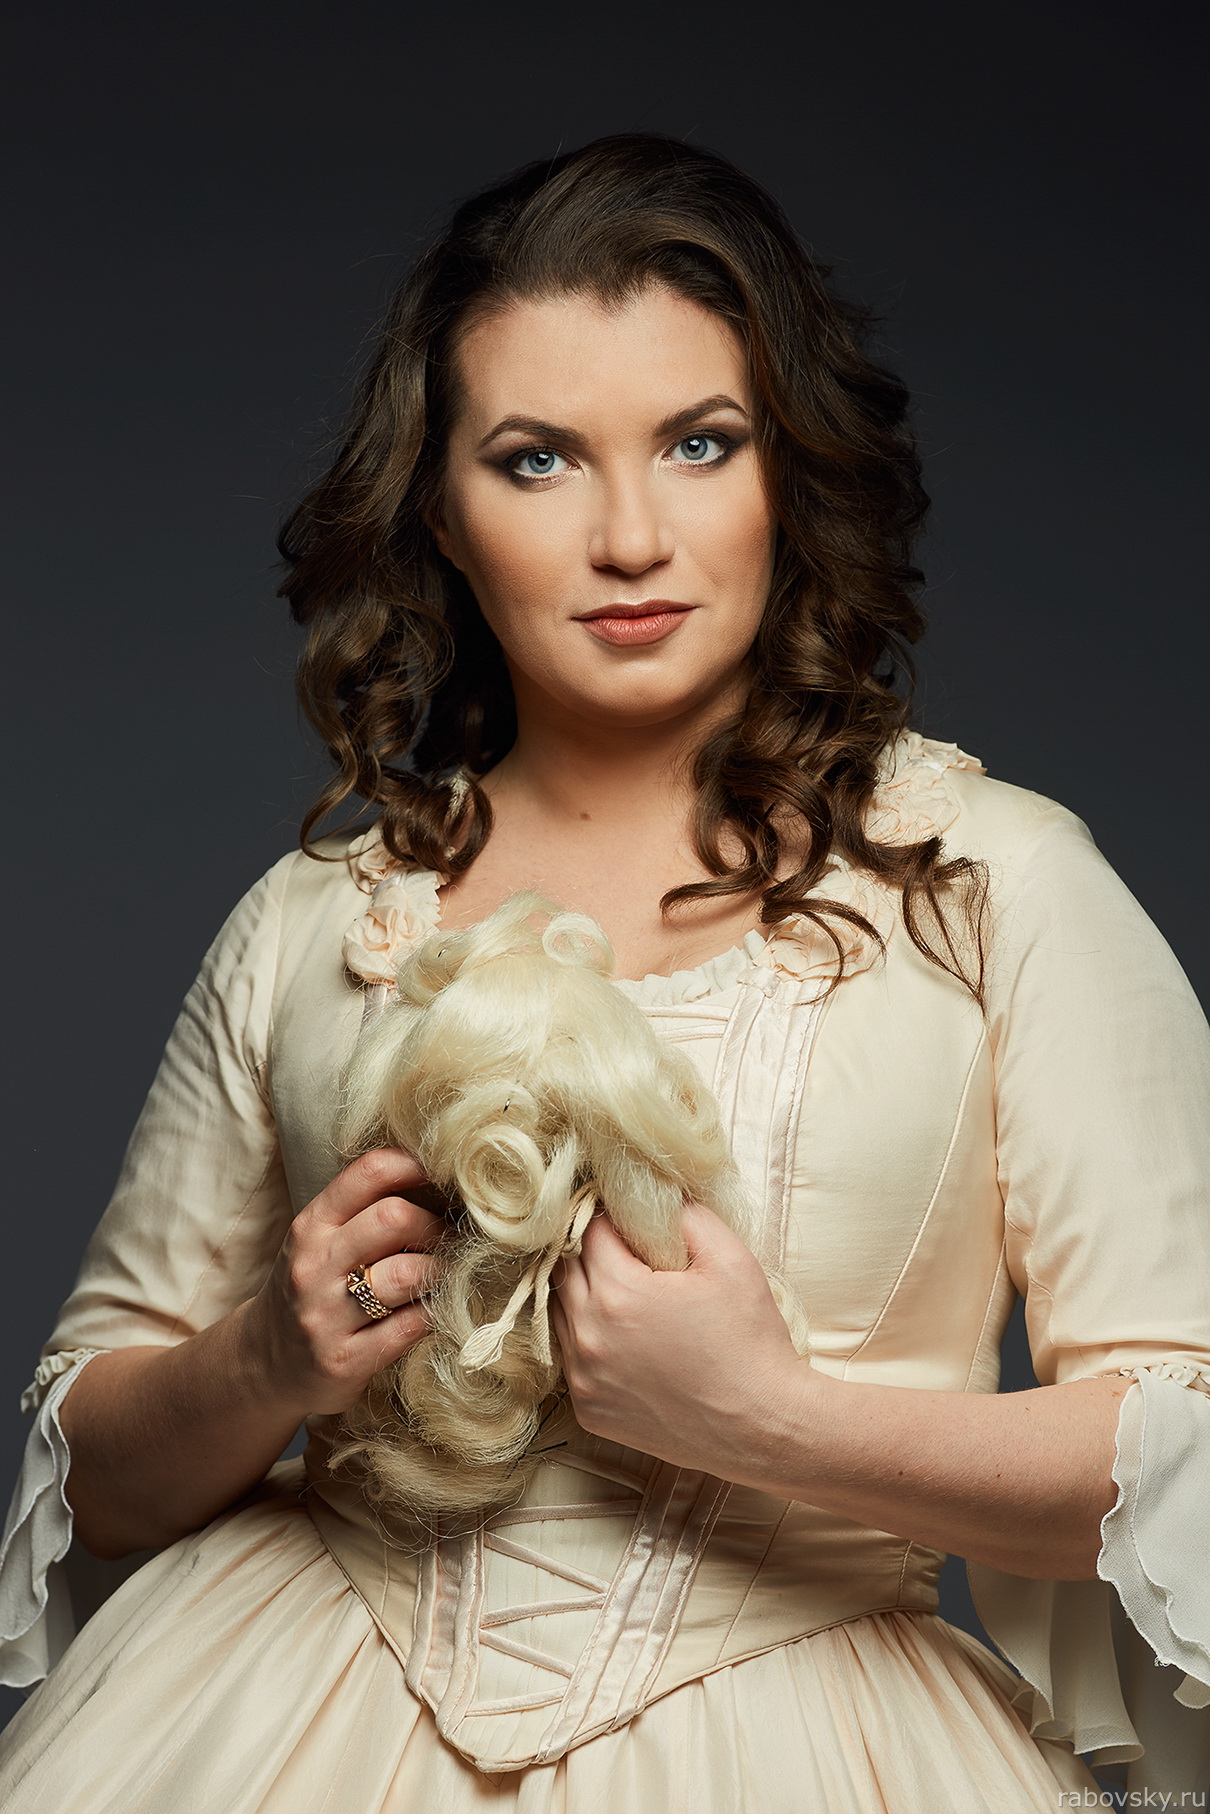 Юлия Маточкина в опере Б. Бриттена «Сон в летнюю ночь»